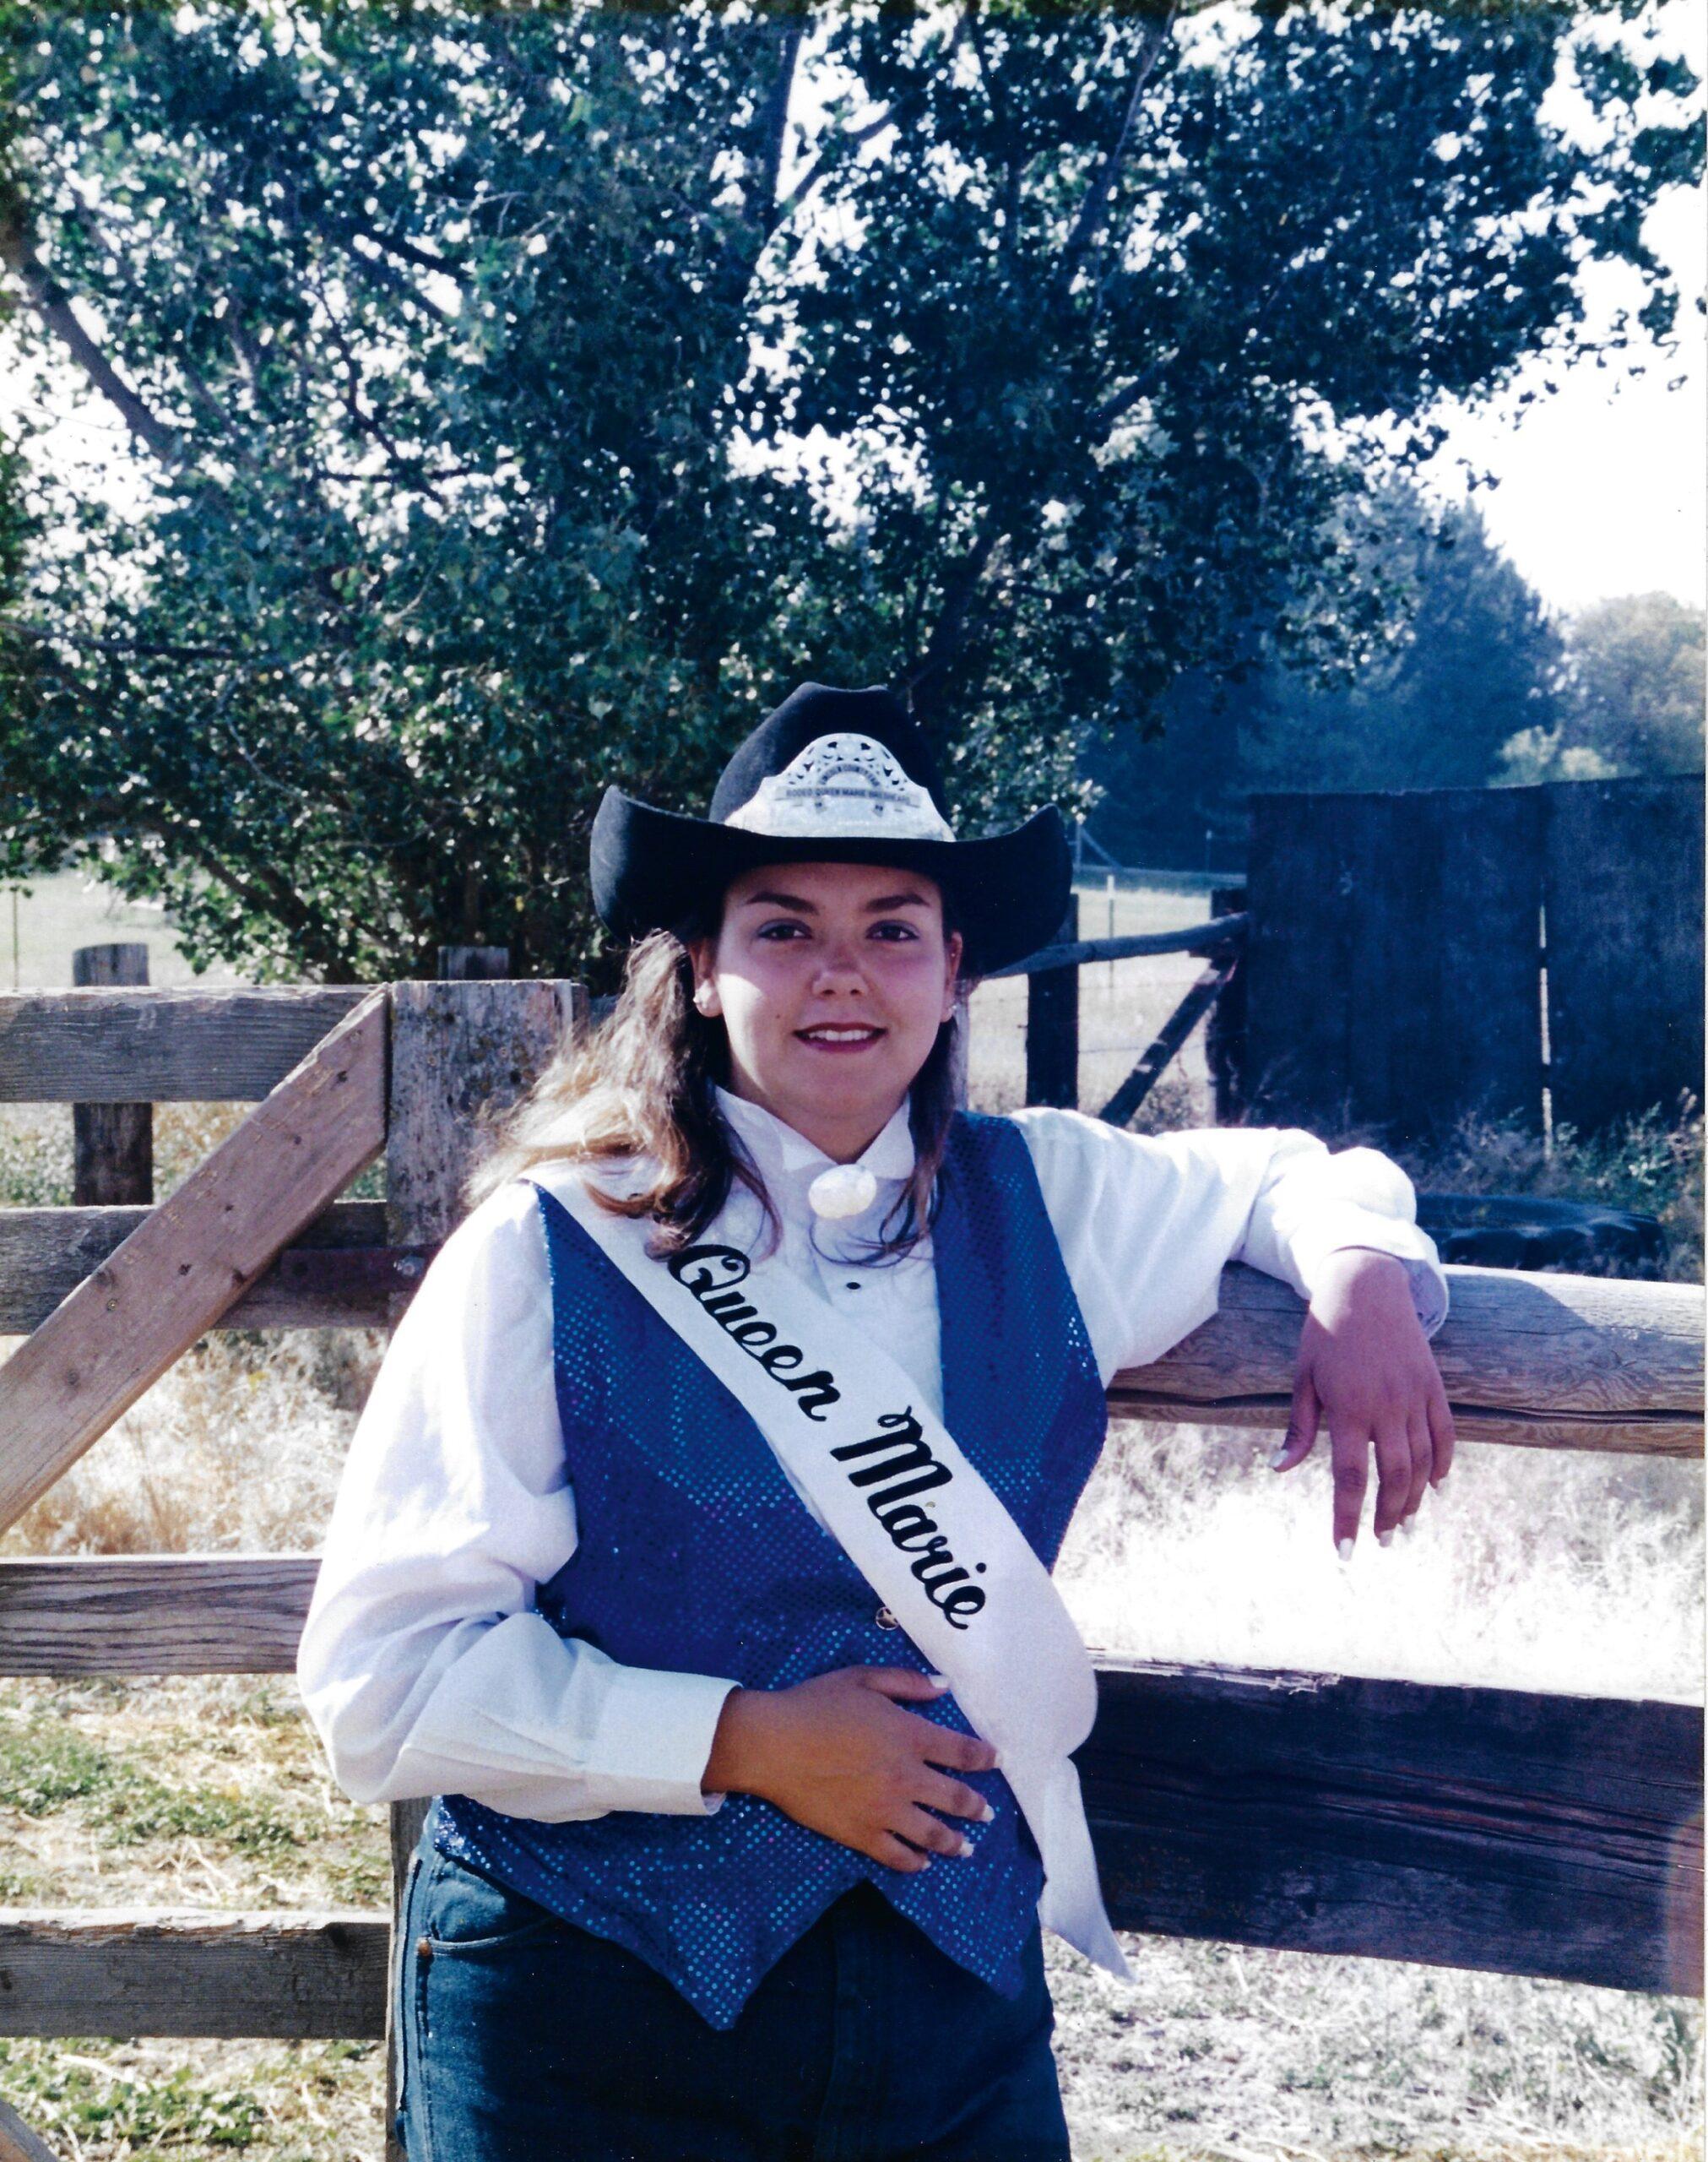 1999 Lincoln County Fair & Rodeo Queen